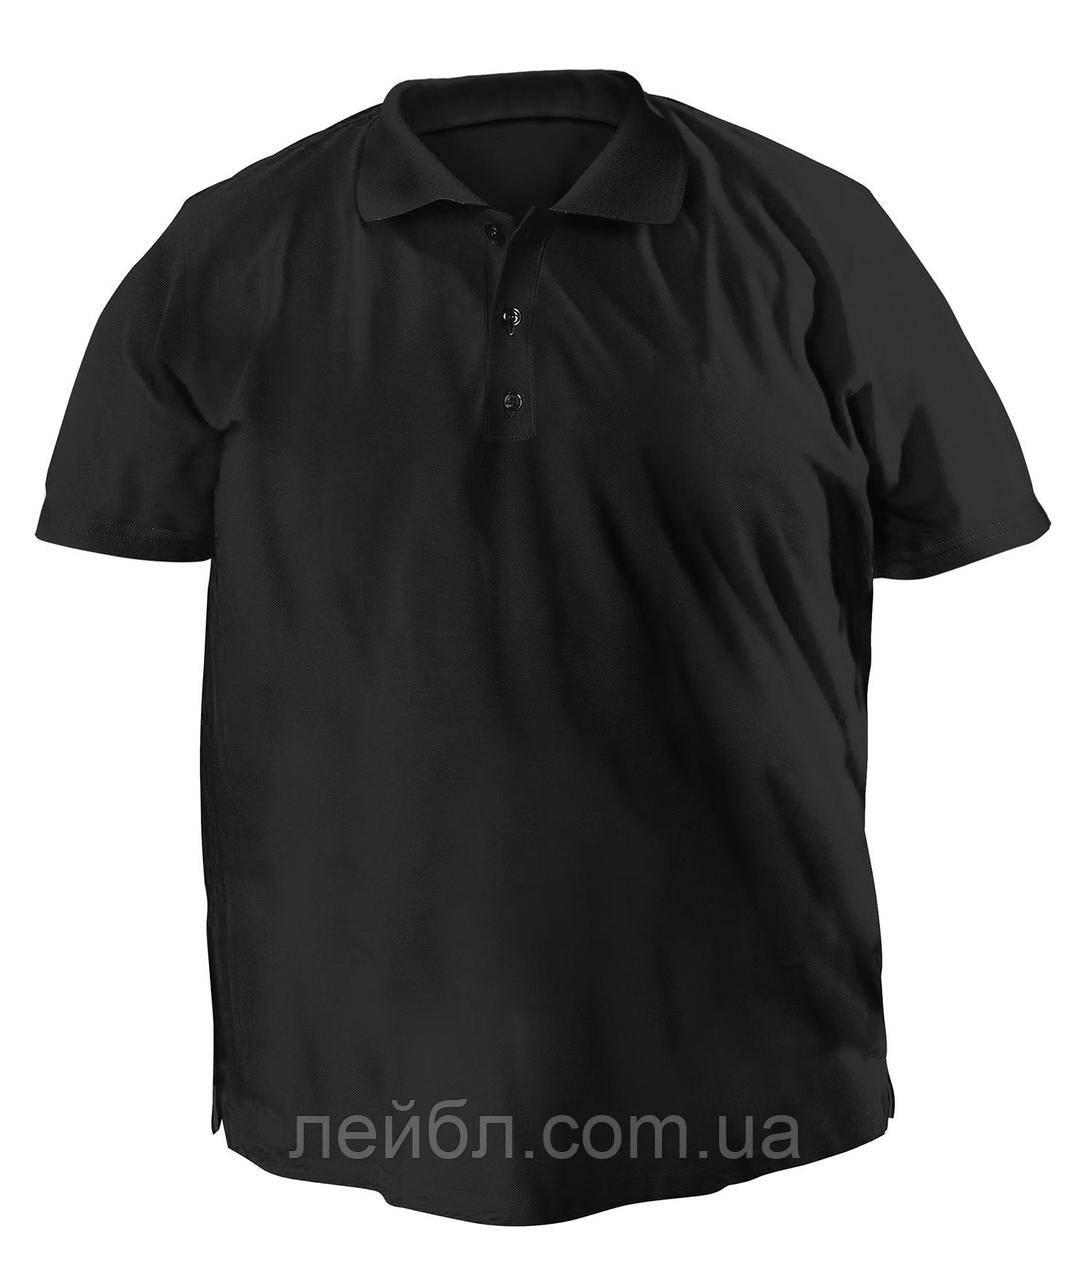 Футболку Polo велика - 7015 чорний